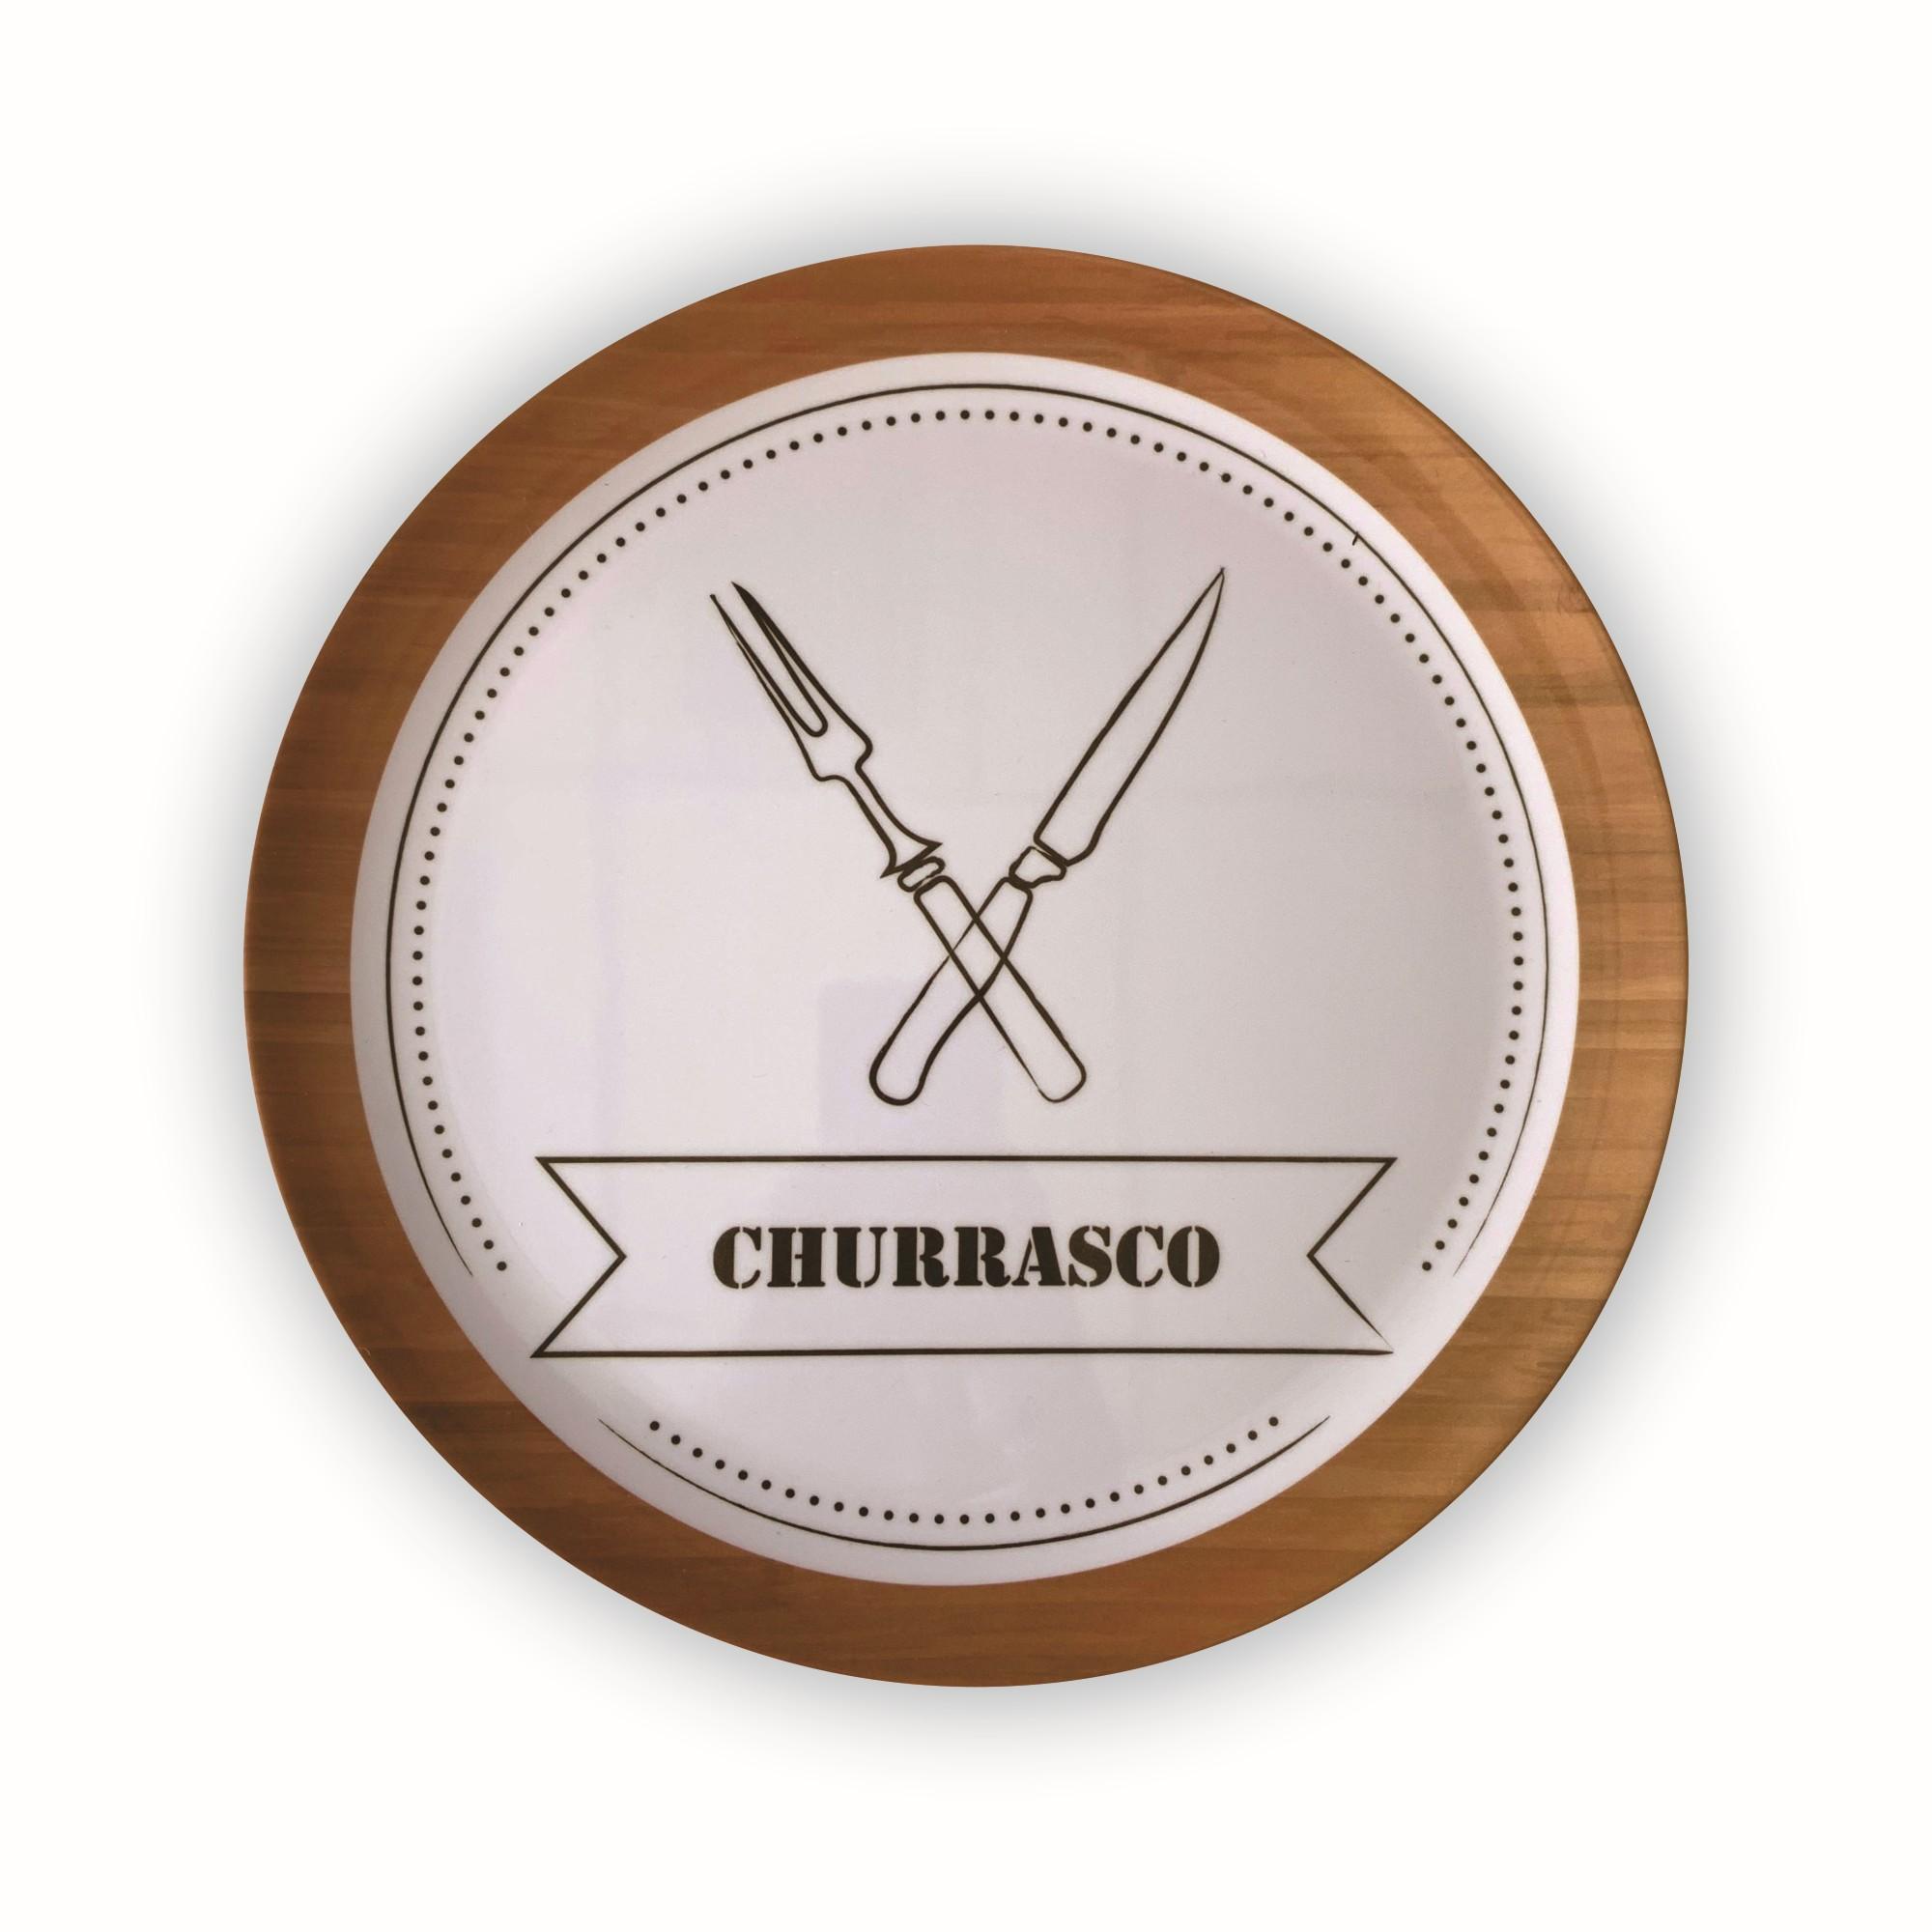 Prato Melanina Raso 27cm Churrasco - Bianchini